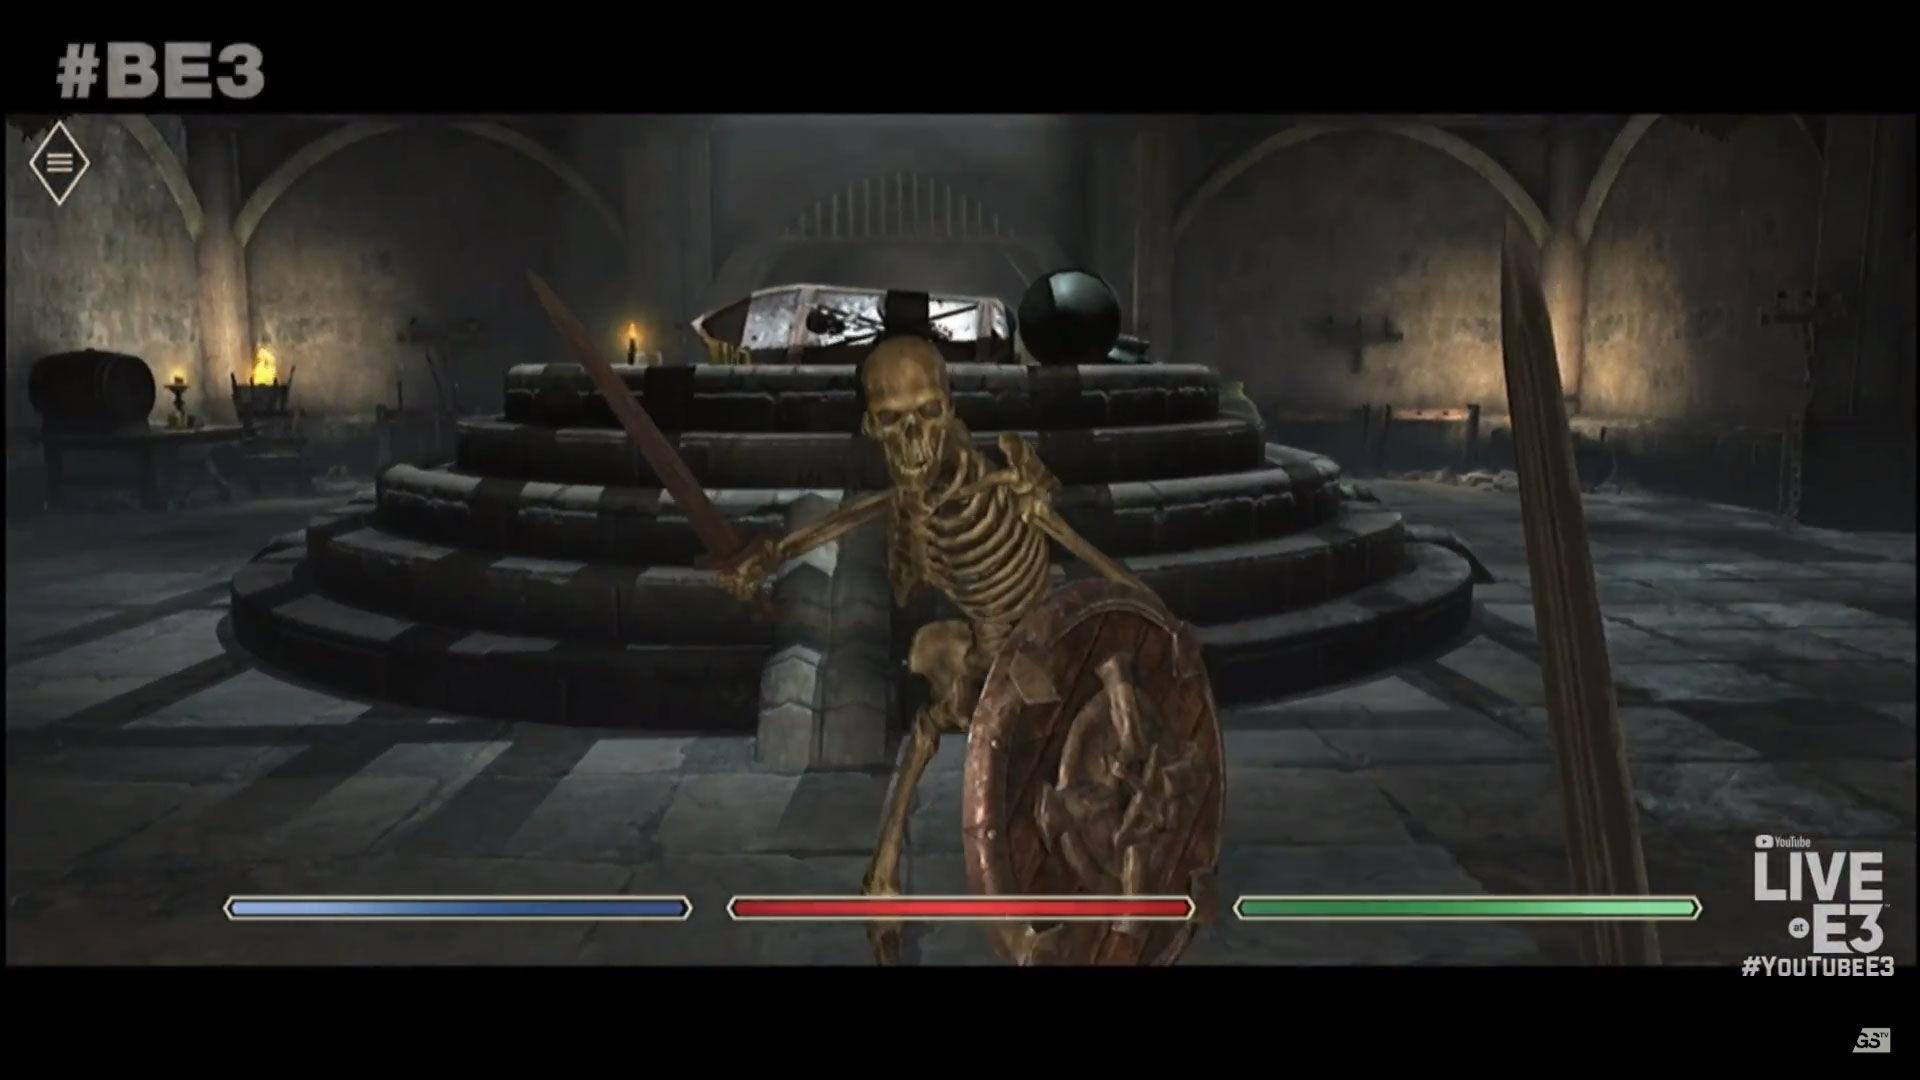 E3 2018 Bethesda The Elder Scrolls Blades